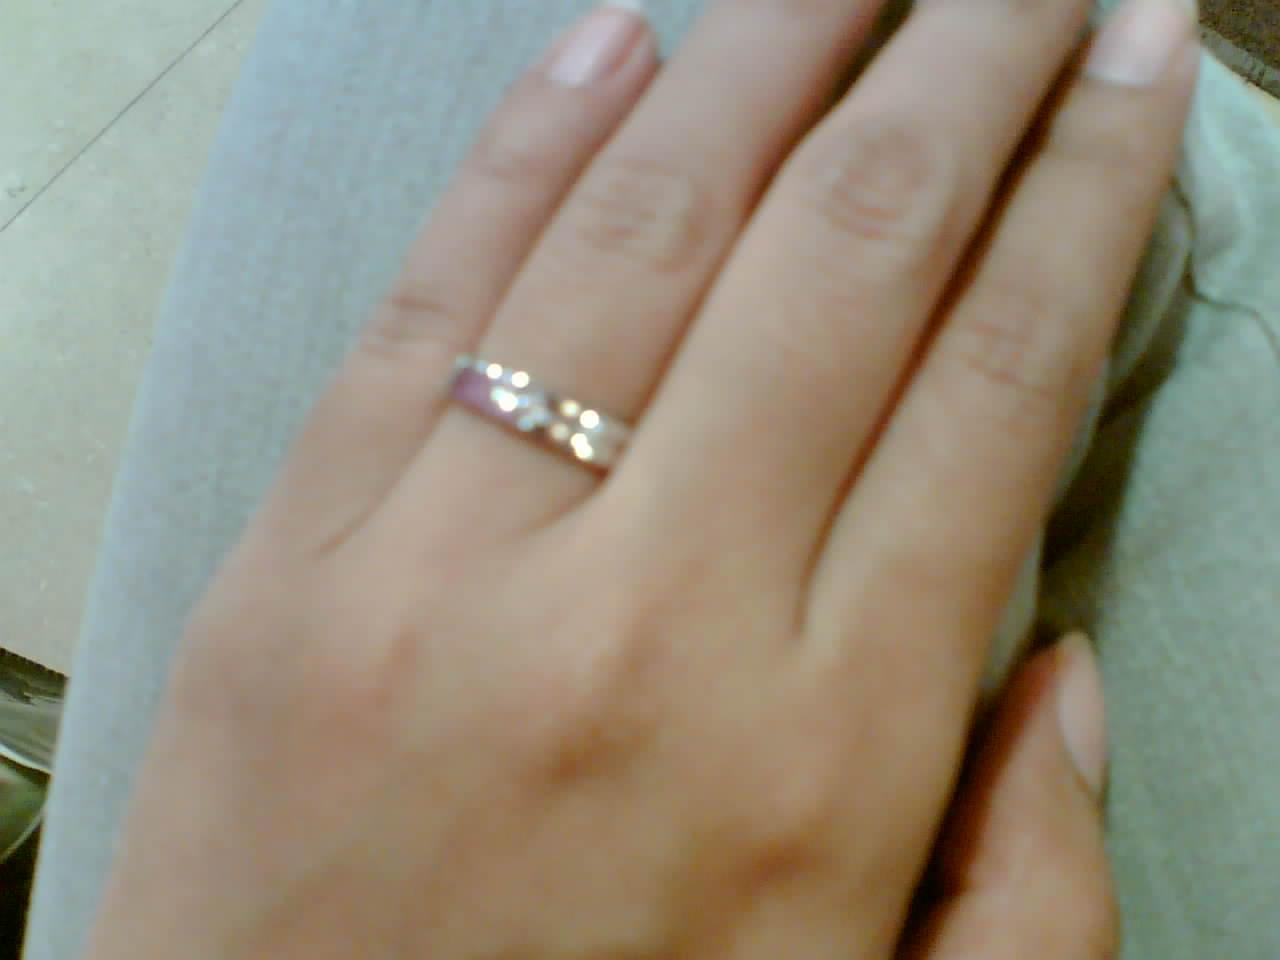 Cincin Tunangan Emas Di Tangan Inspirasi Pernikahan